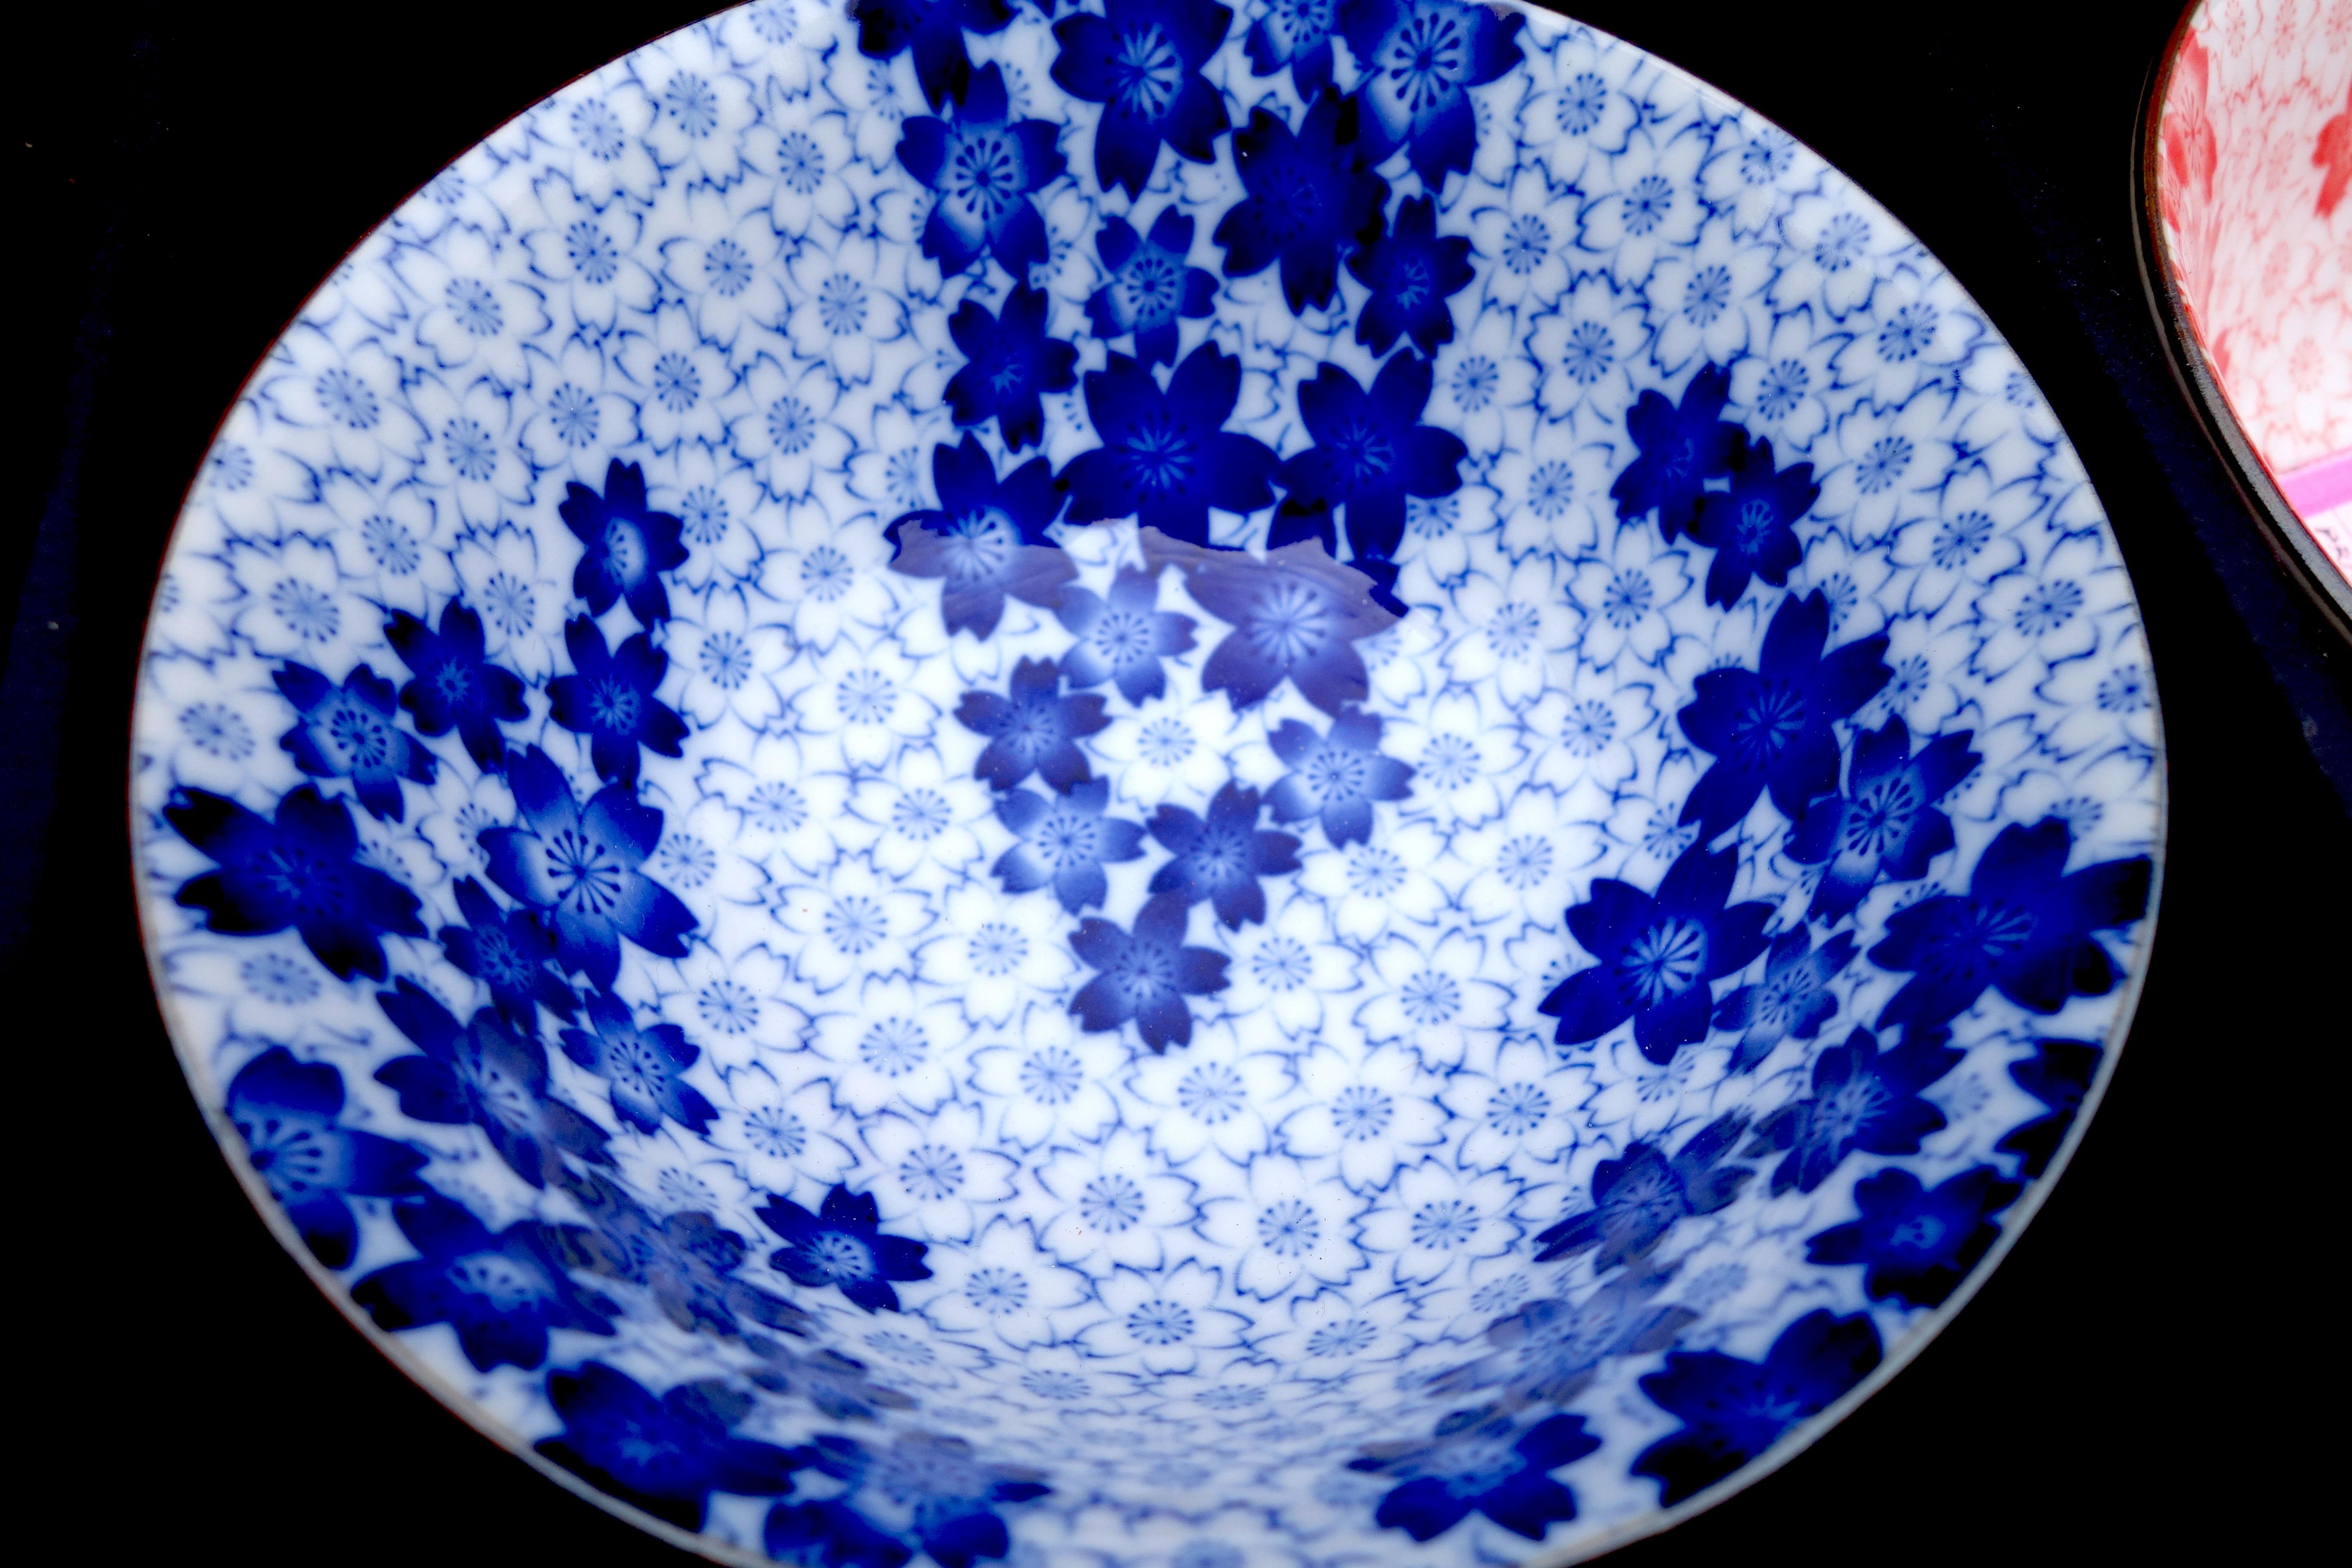 blue bowl japan matsuri festival 2014